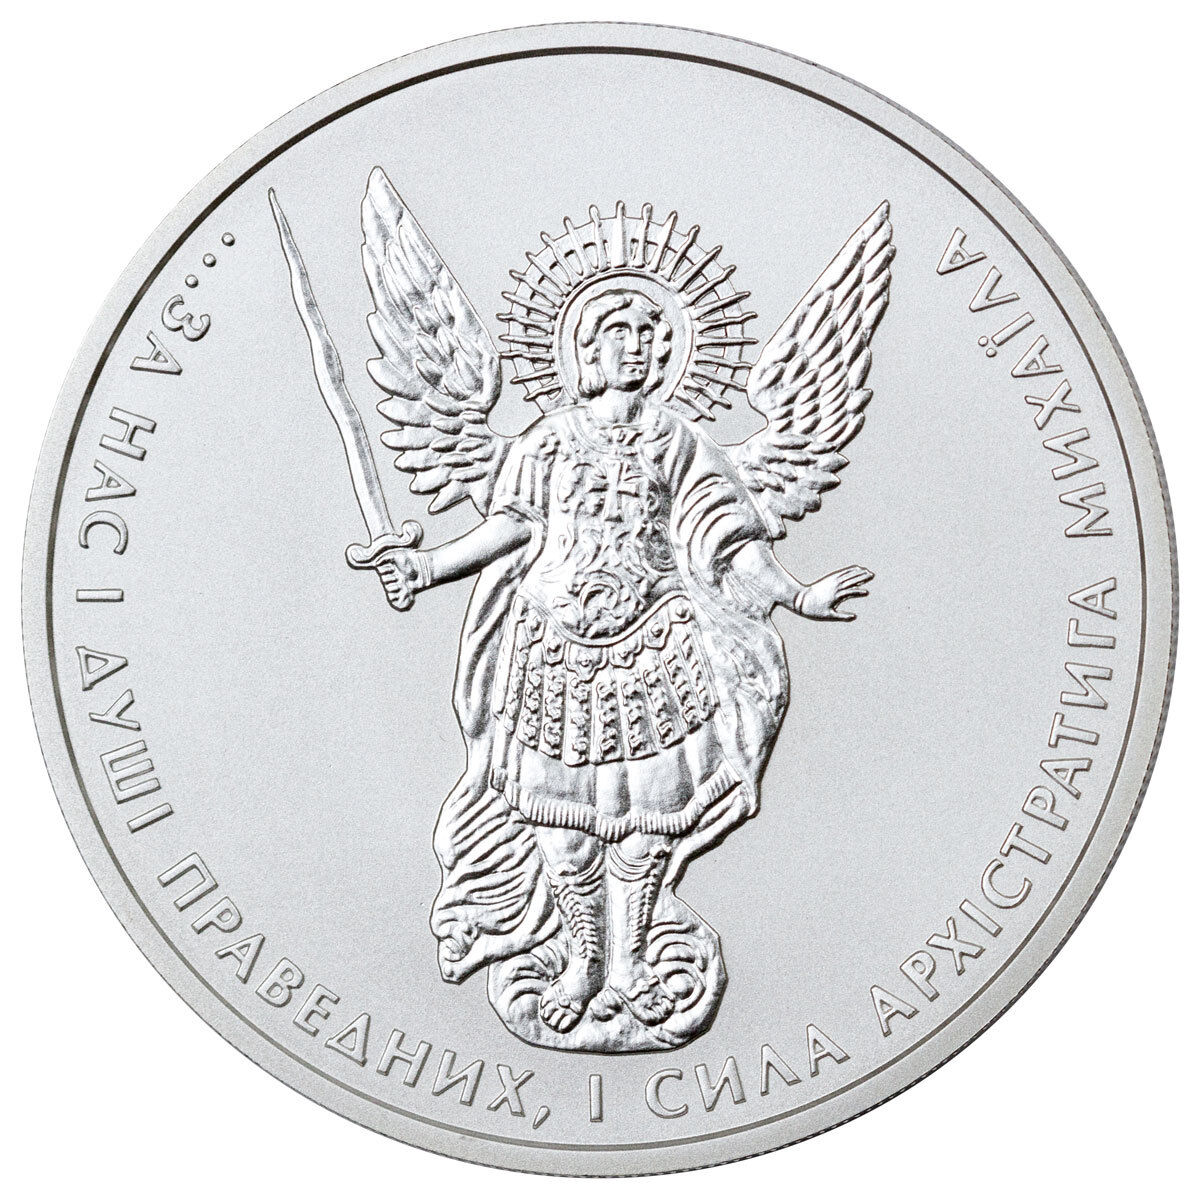 Купить 2015 Ukraine 1 oz. Silver Archangel Michael Coin BU SKU46335